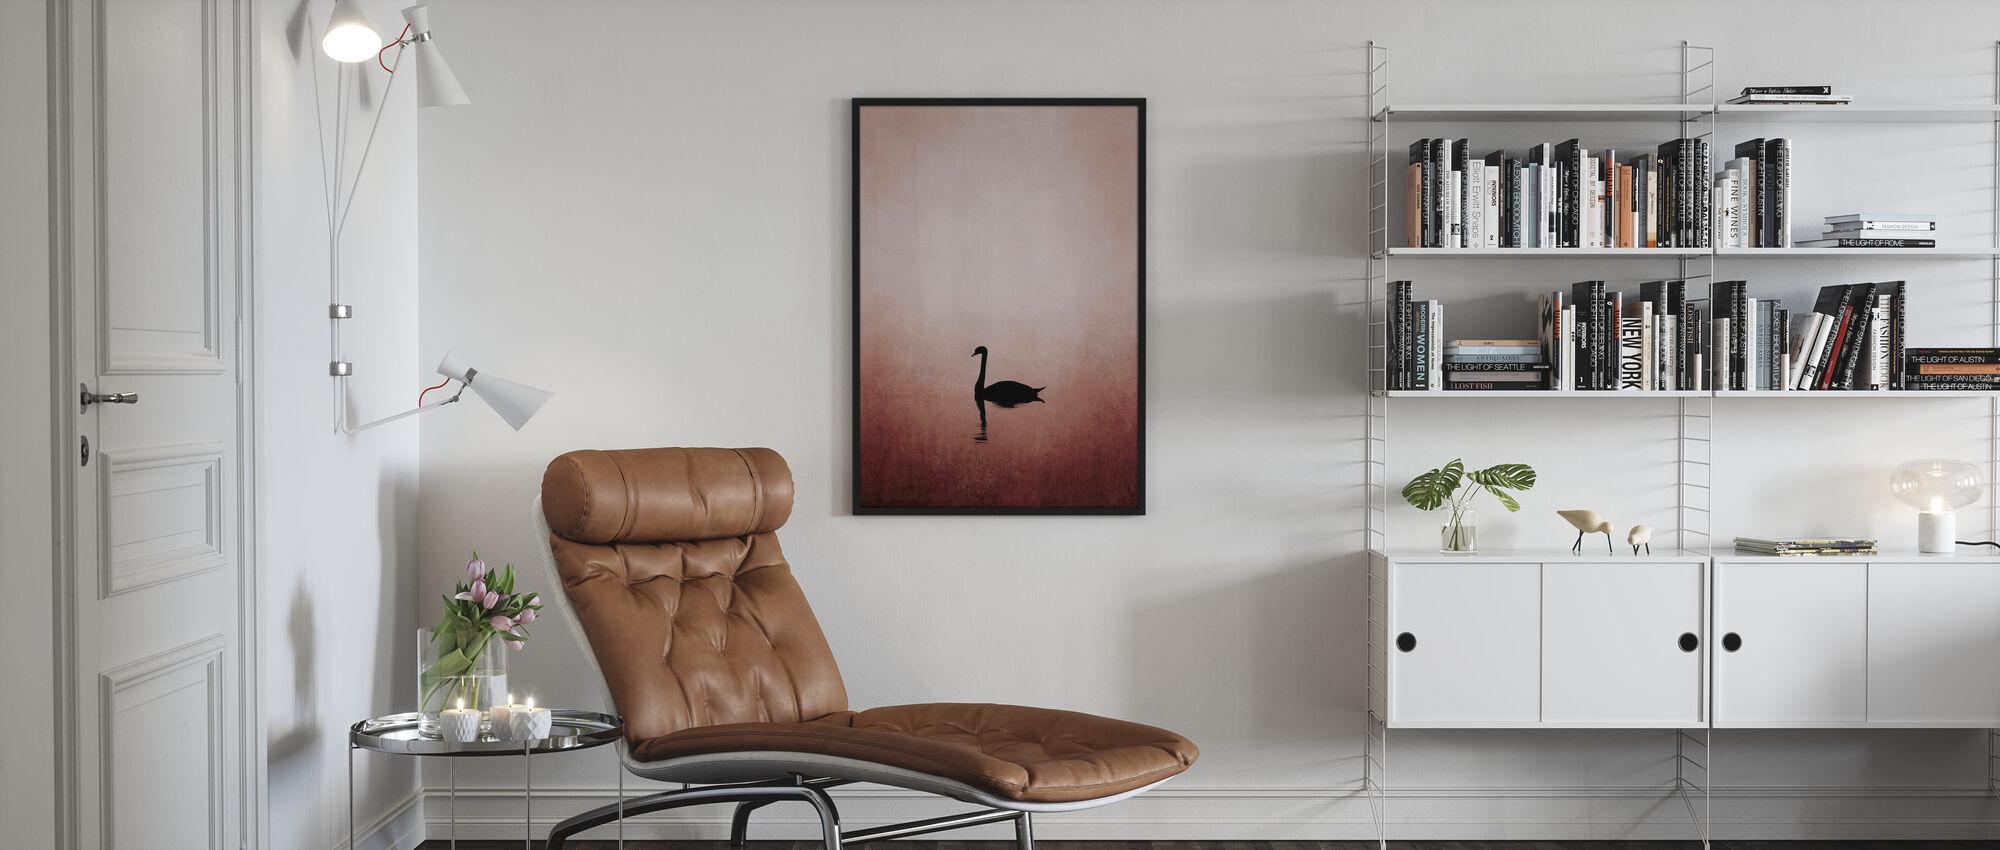 Lake - Poster - Living Room